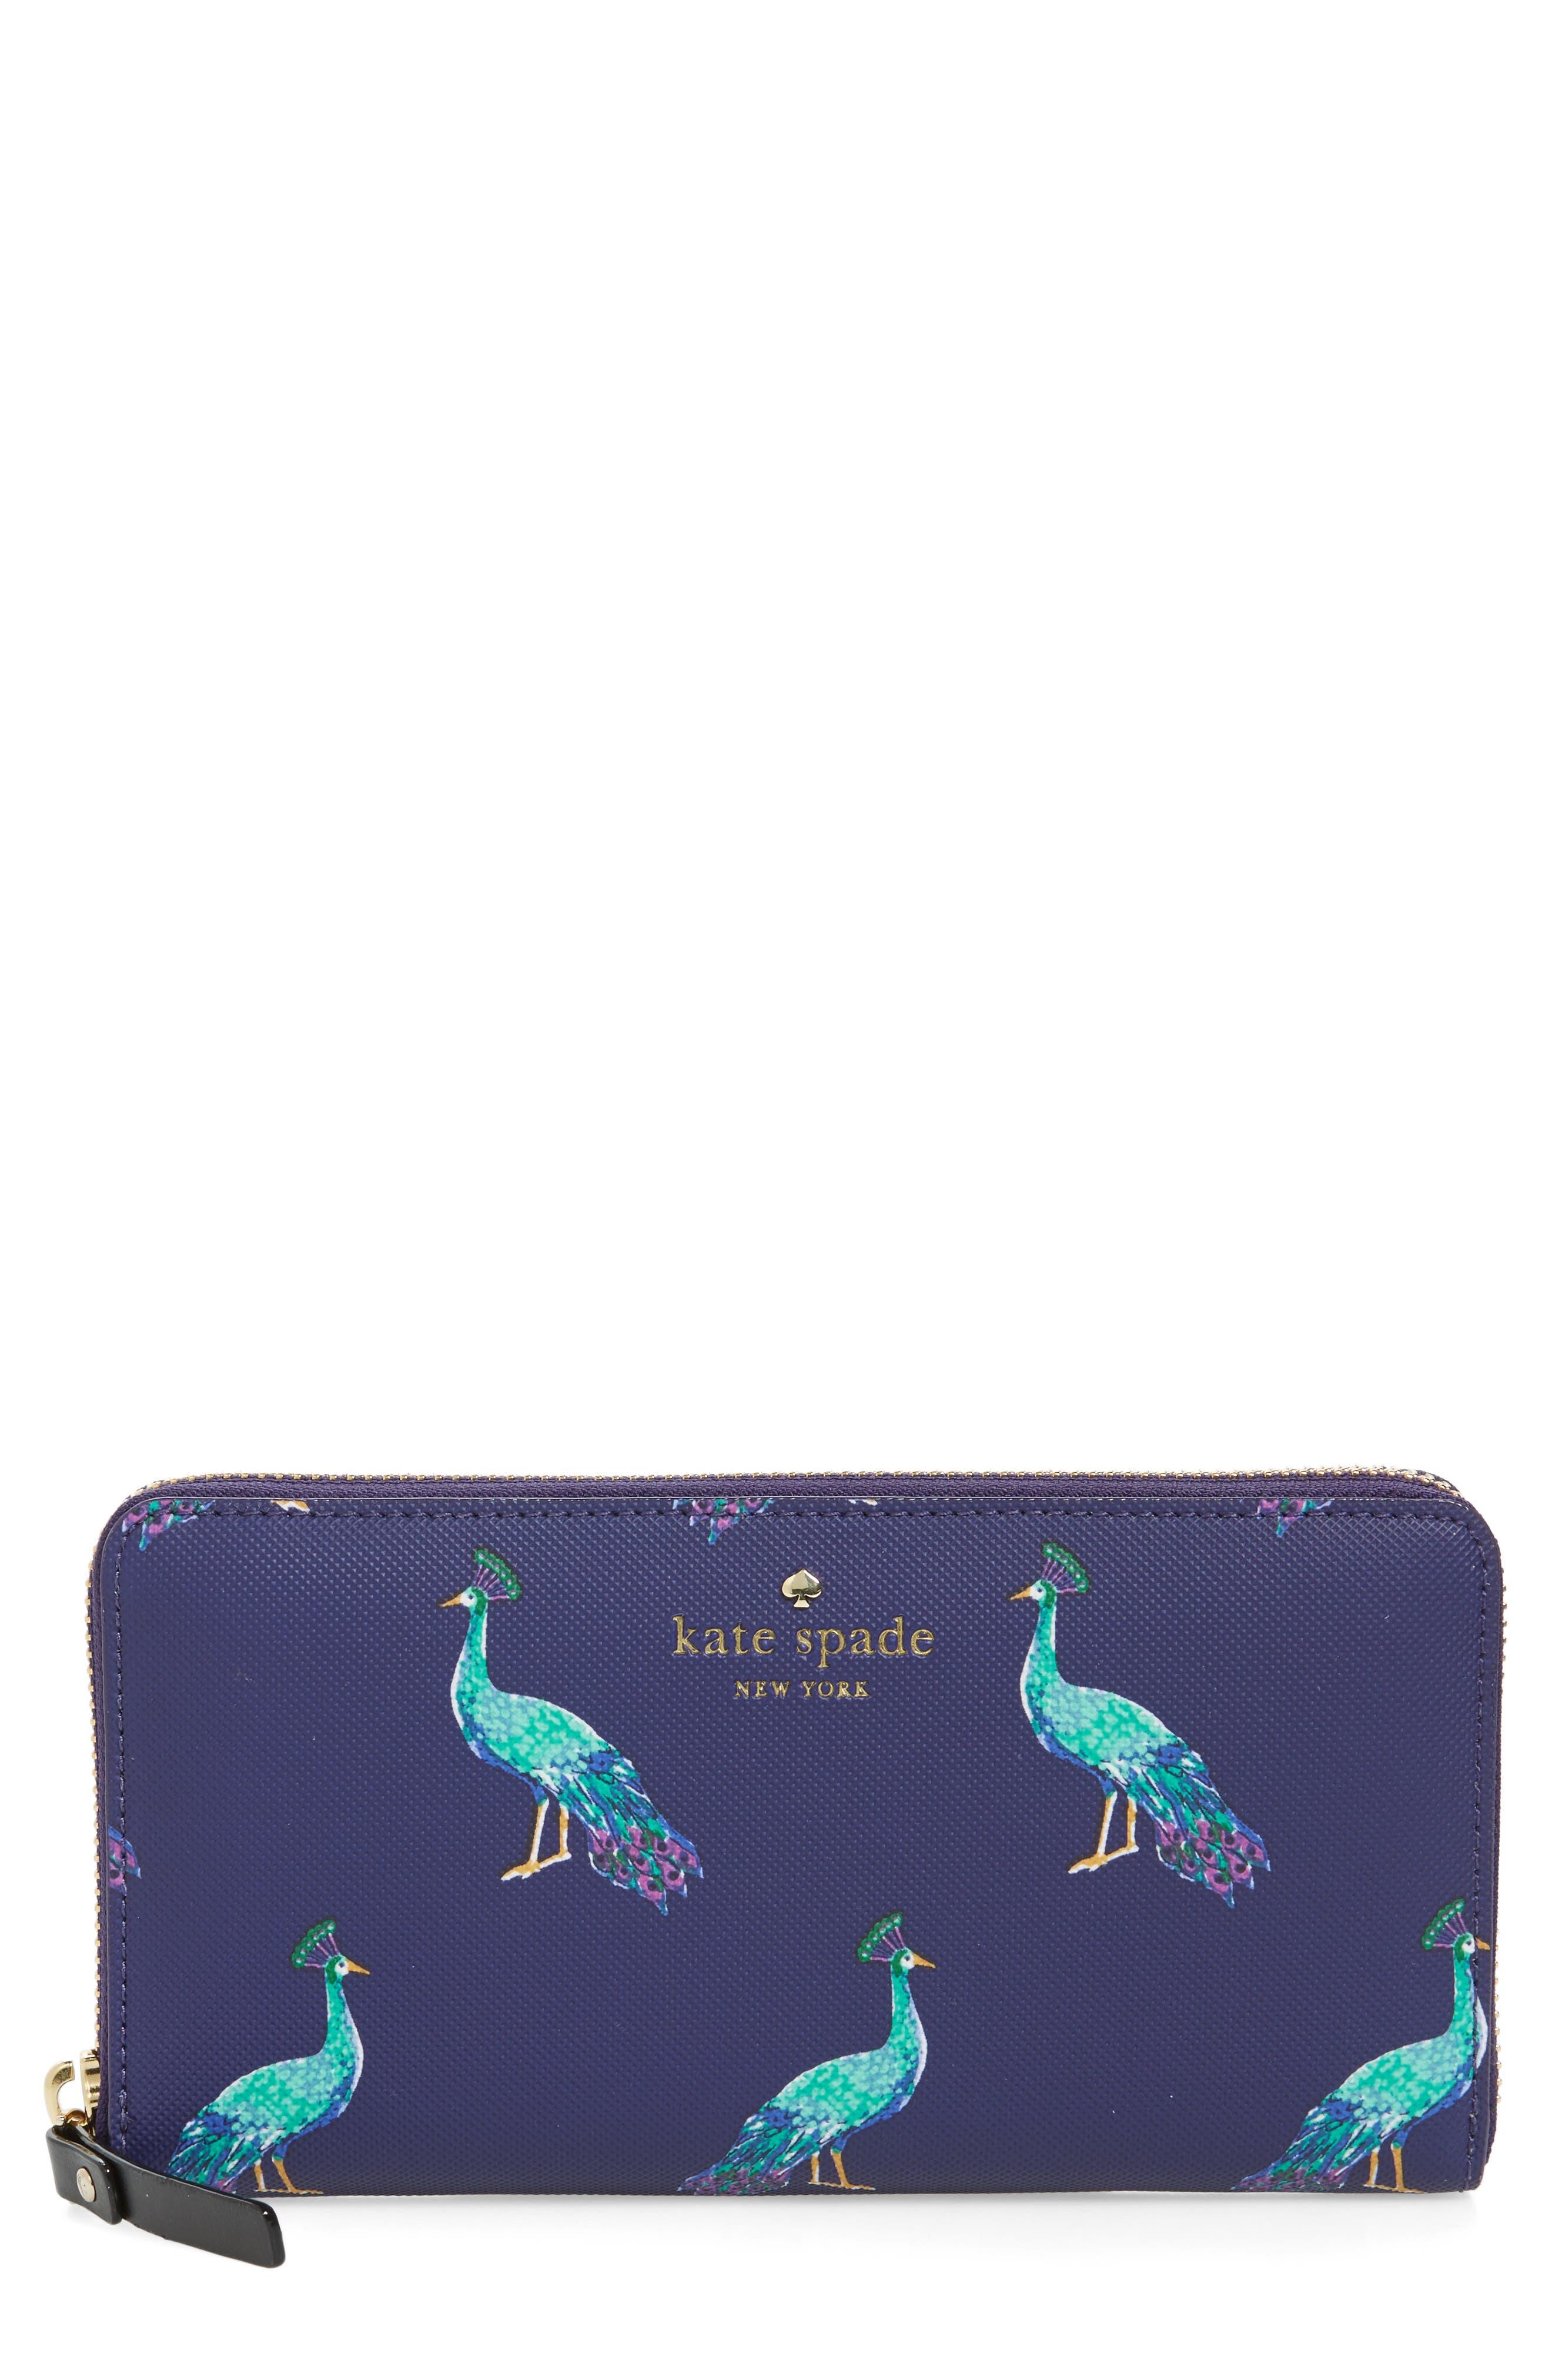 Main Image - kate spade new york harding street - lacey wallet